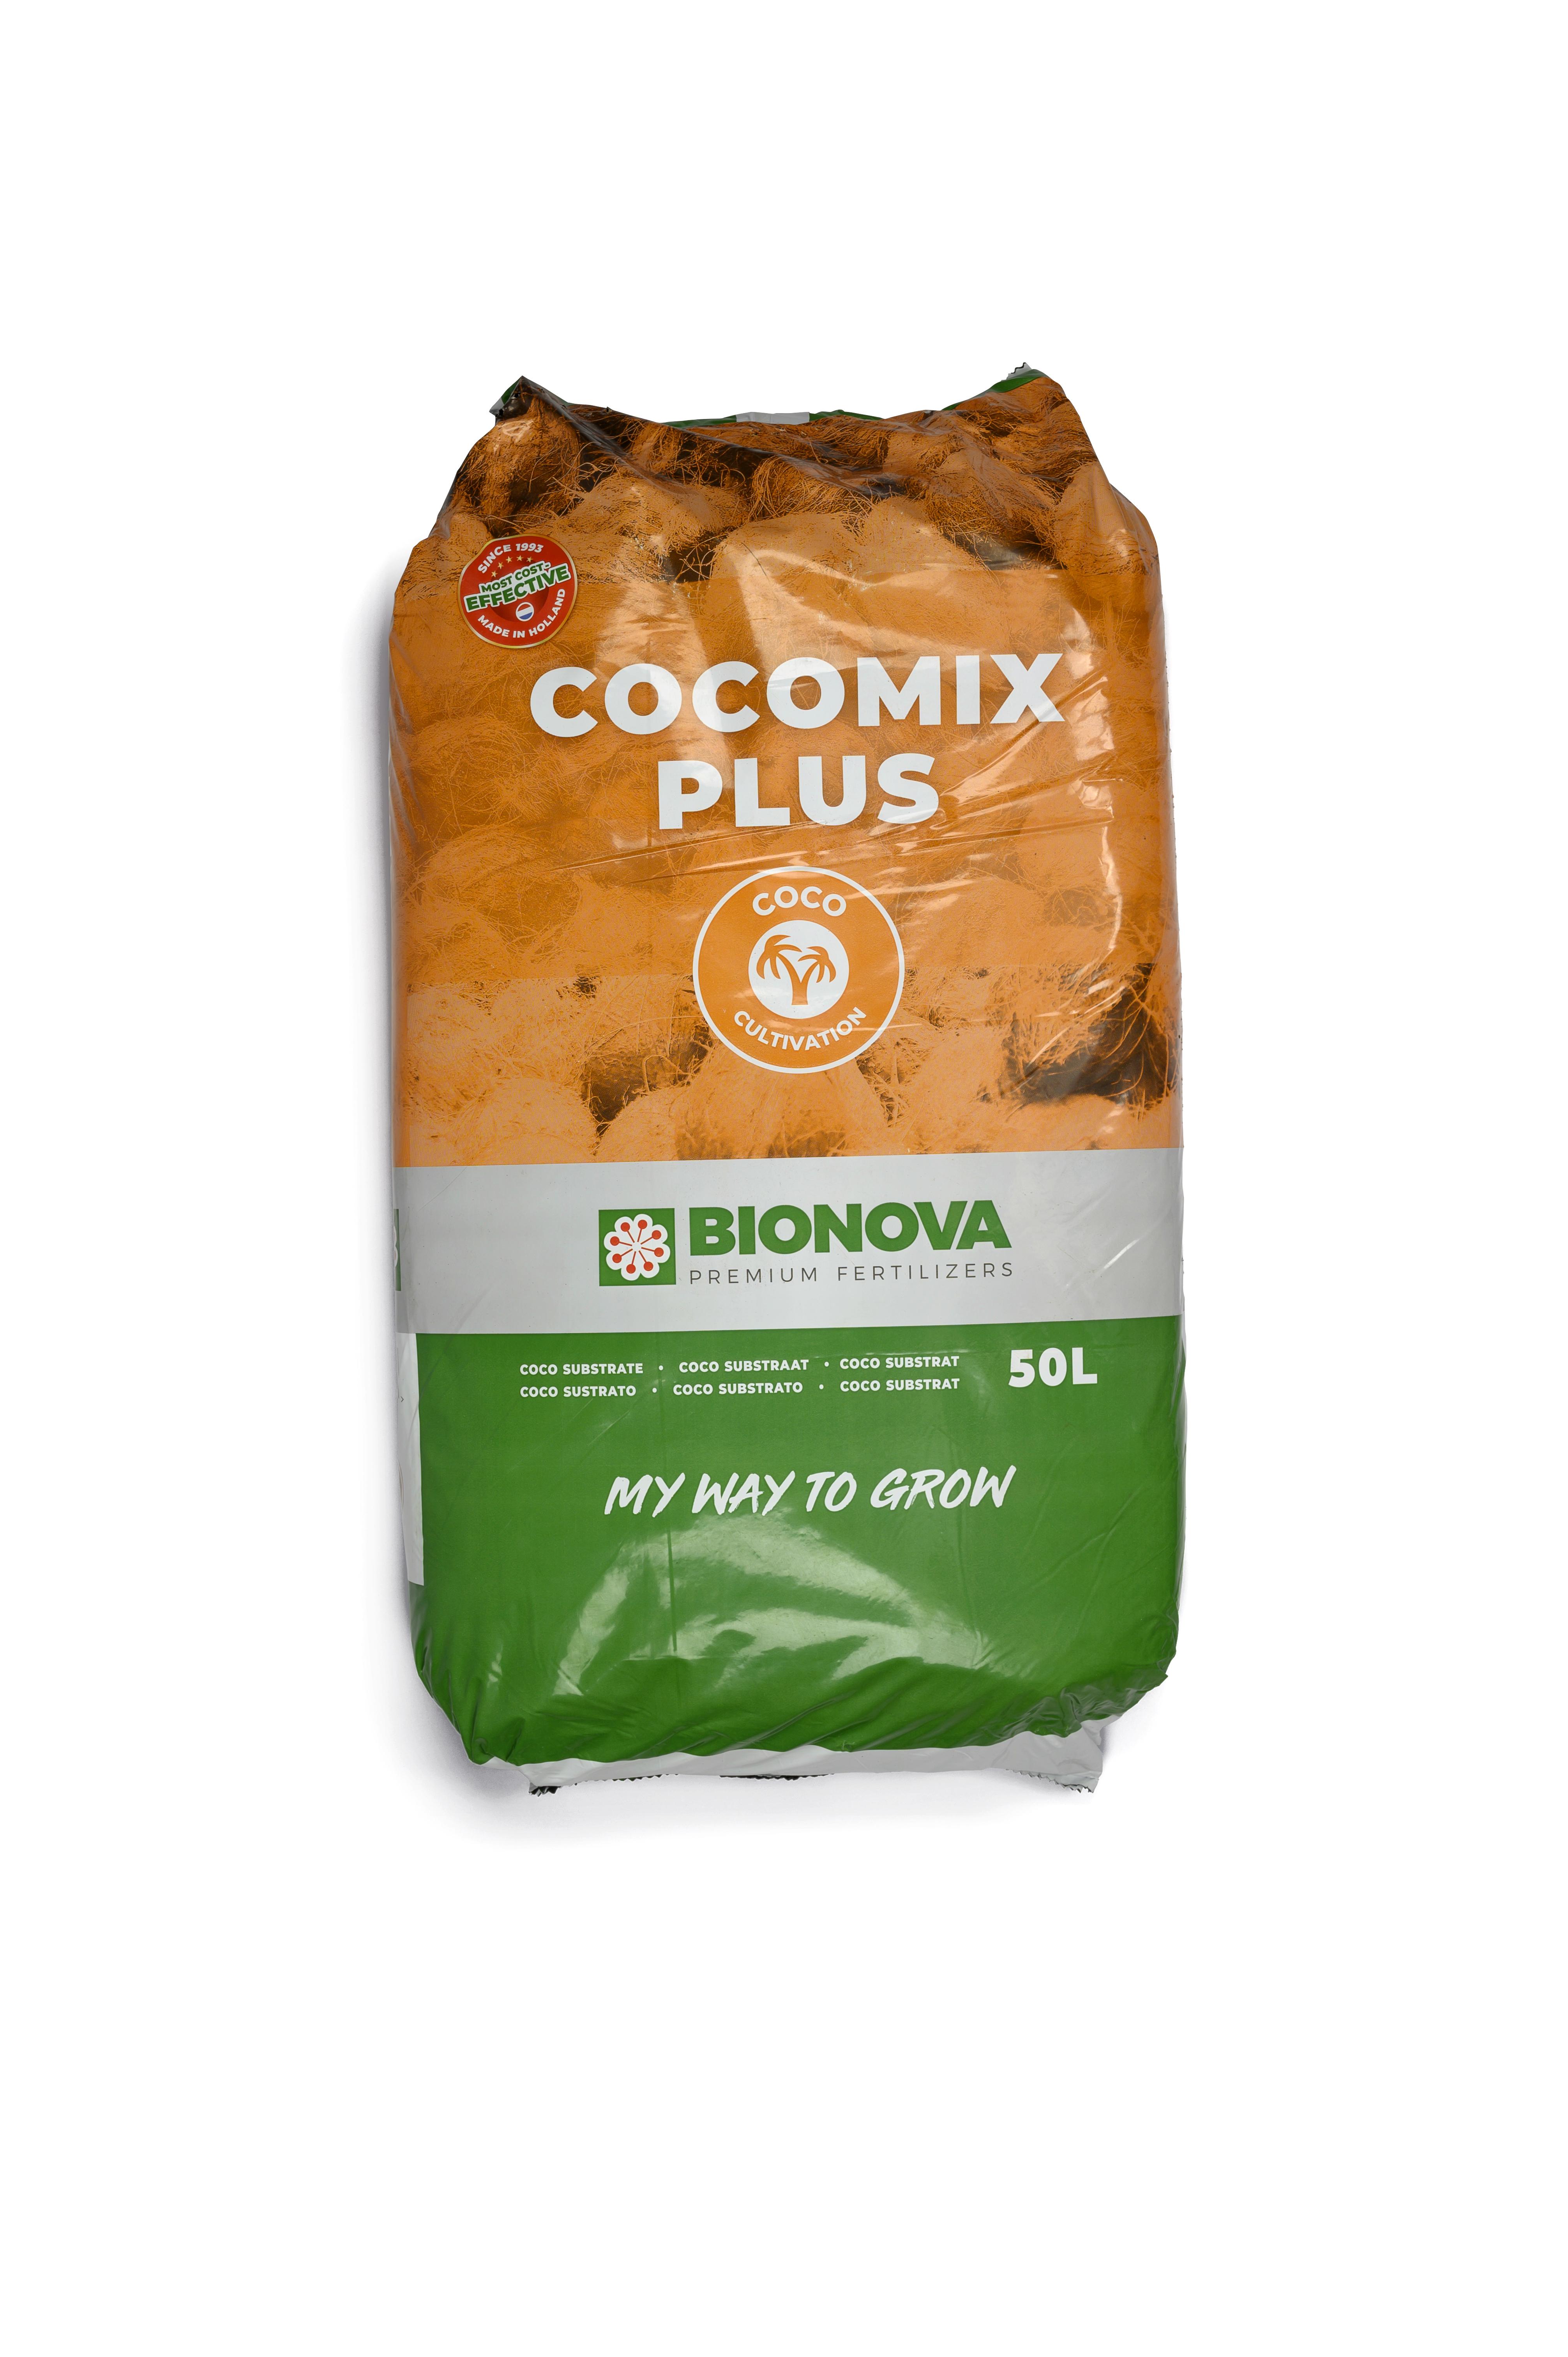 Bionova Cocomix Plus